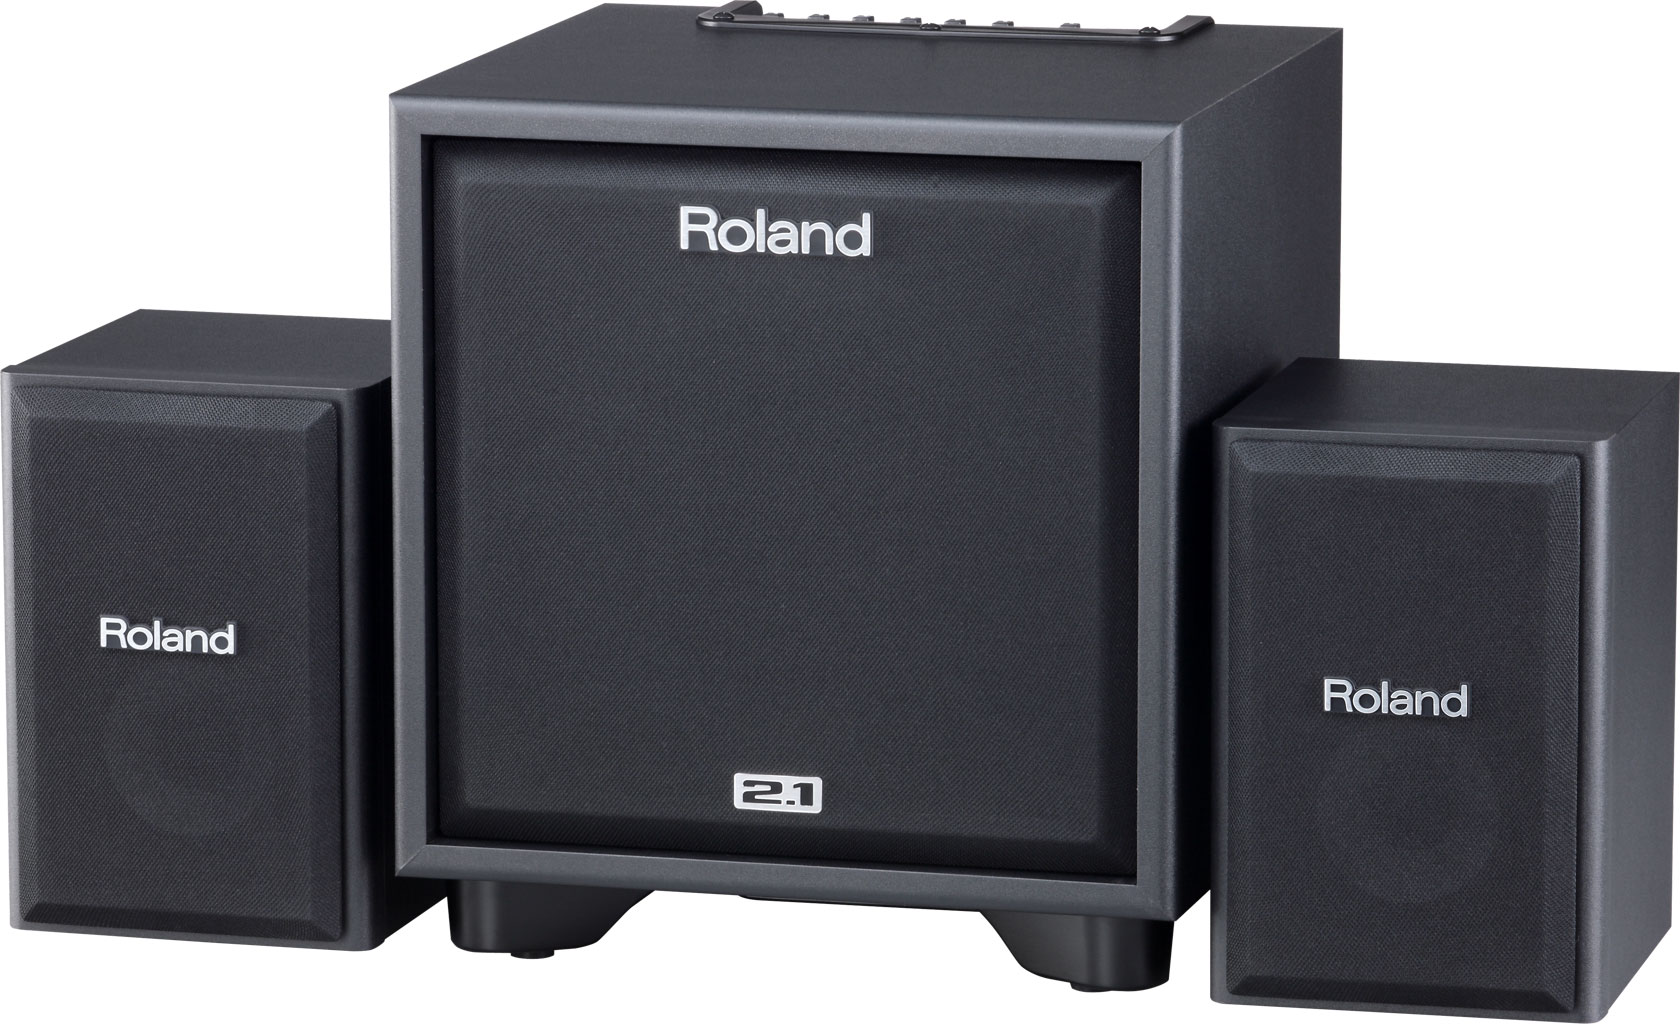 Uitgelezene CM-110 | CUBE Monitor - Roland BT-29